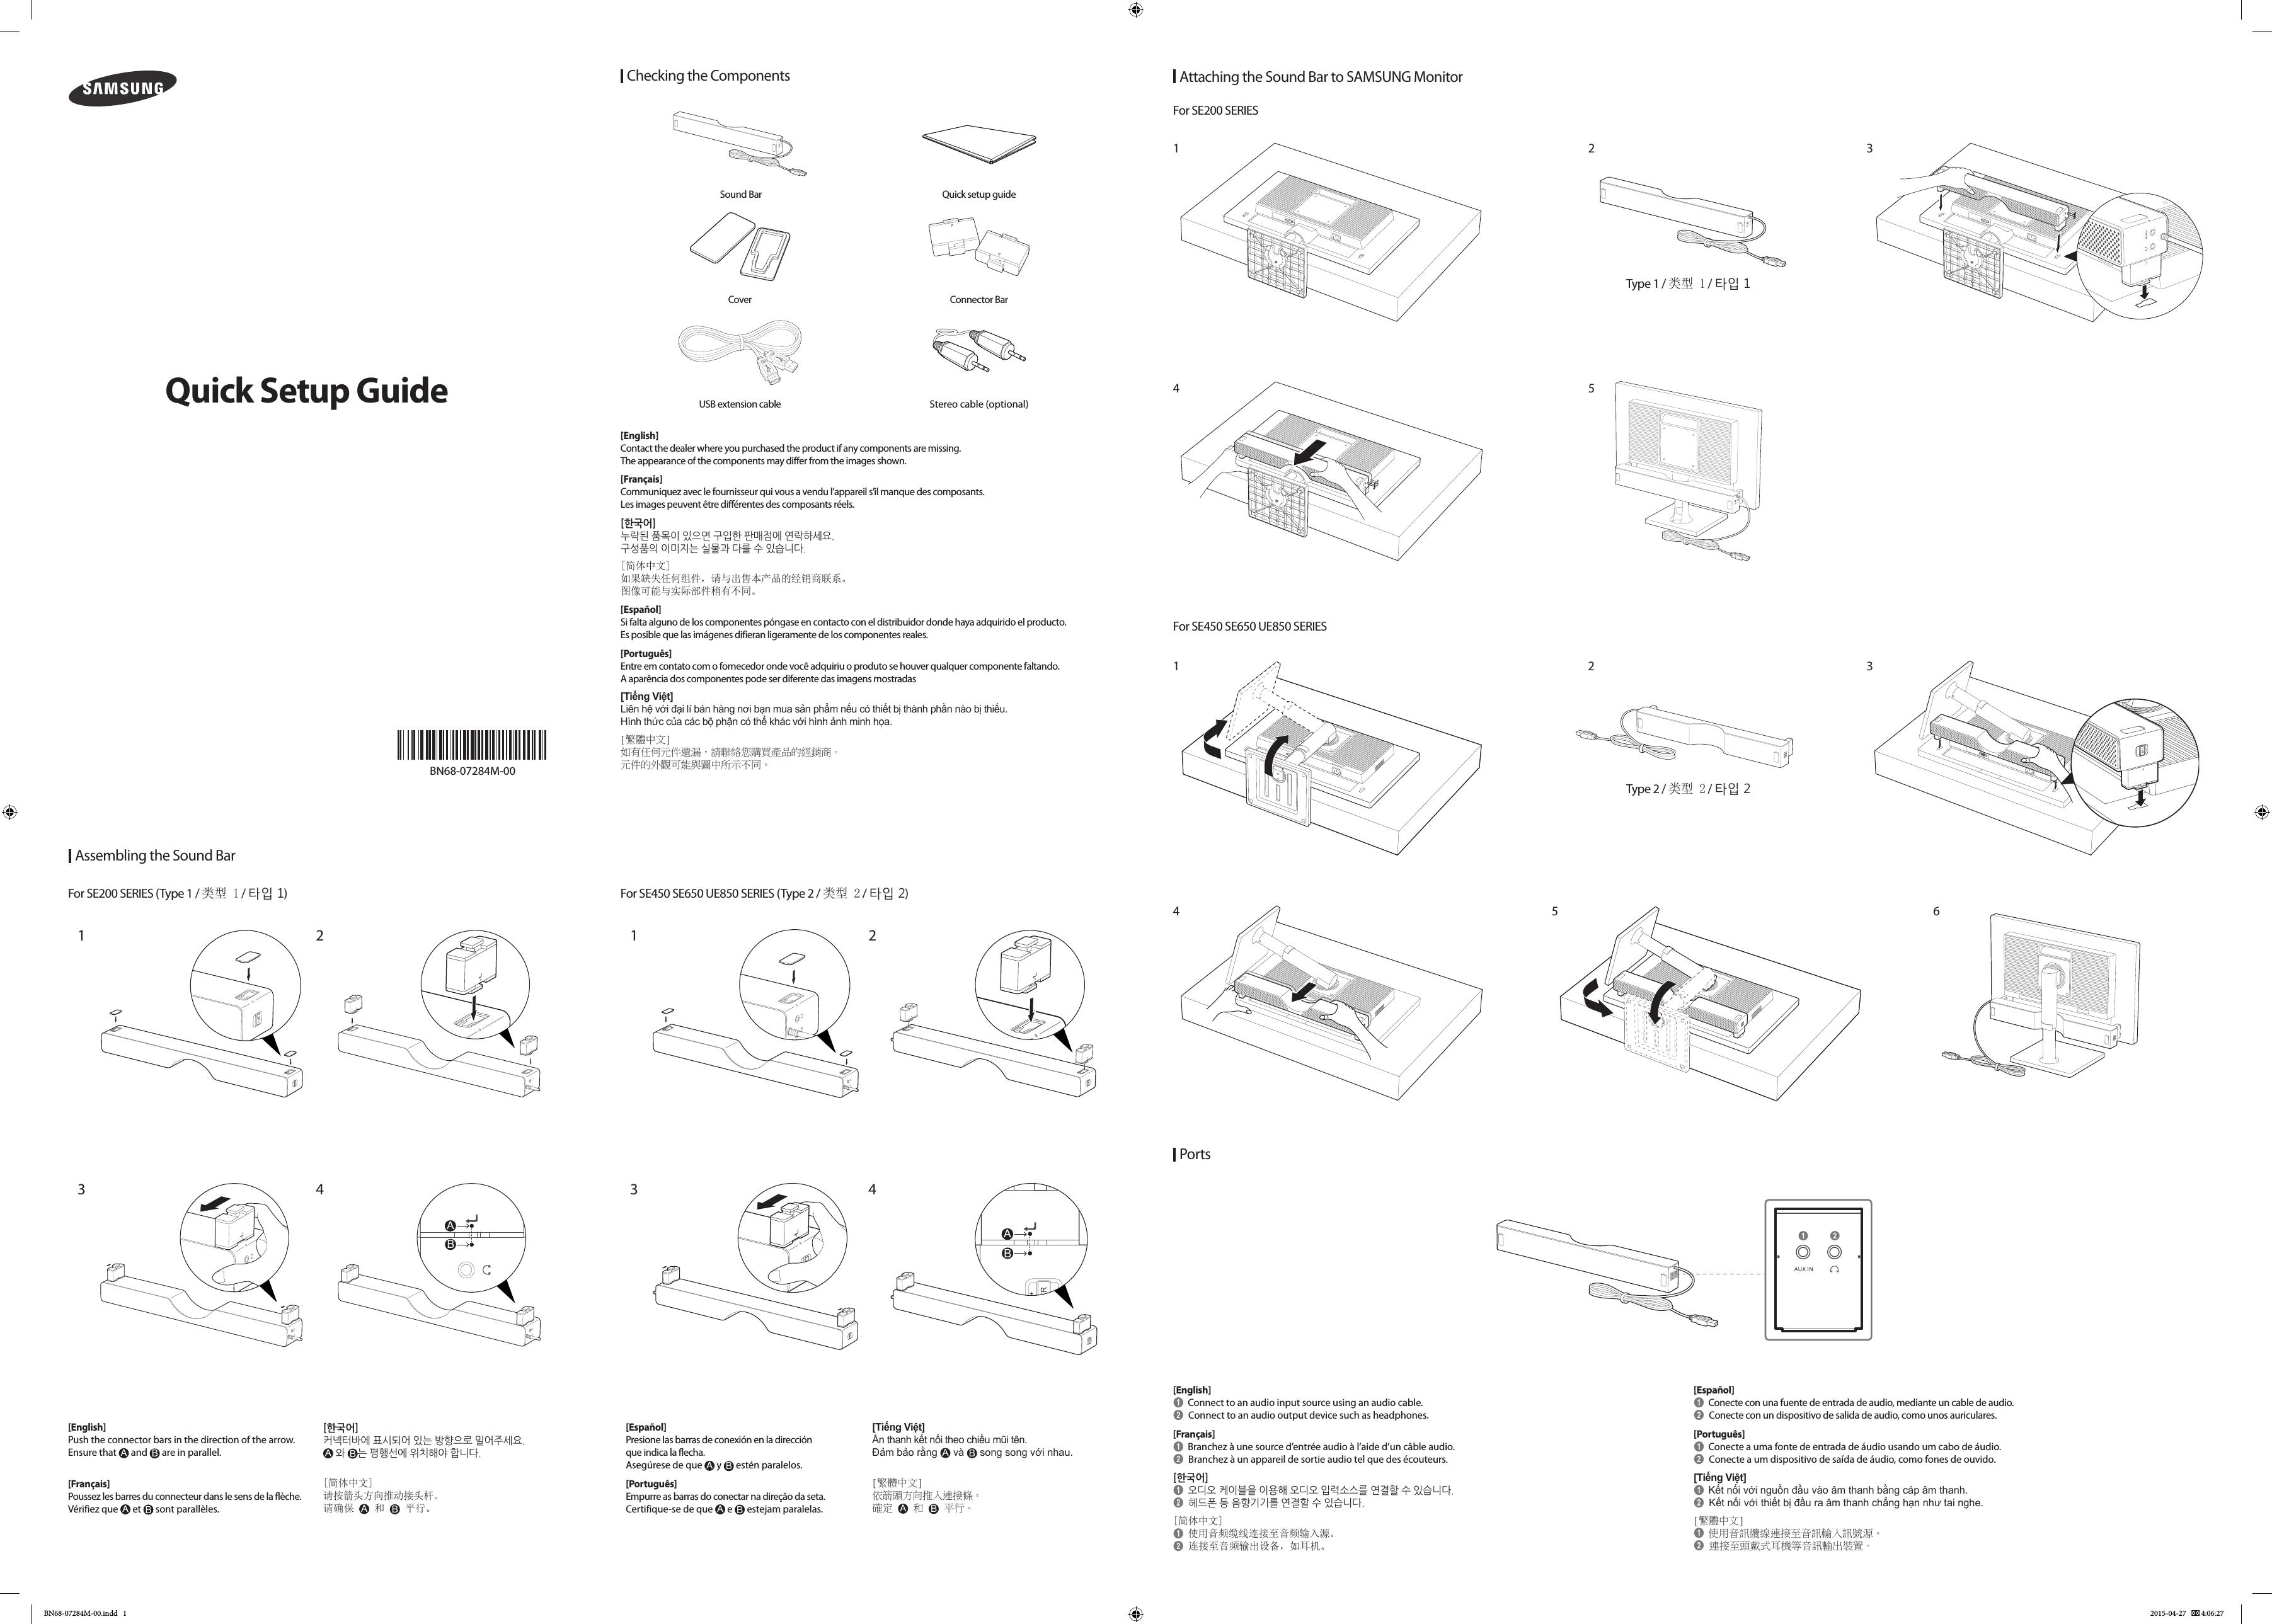 Samsung Electronics Co SPU10 Sound Bar User Manual v1